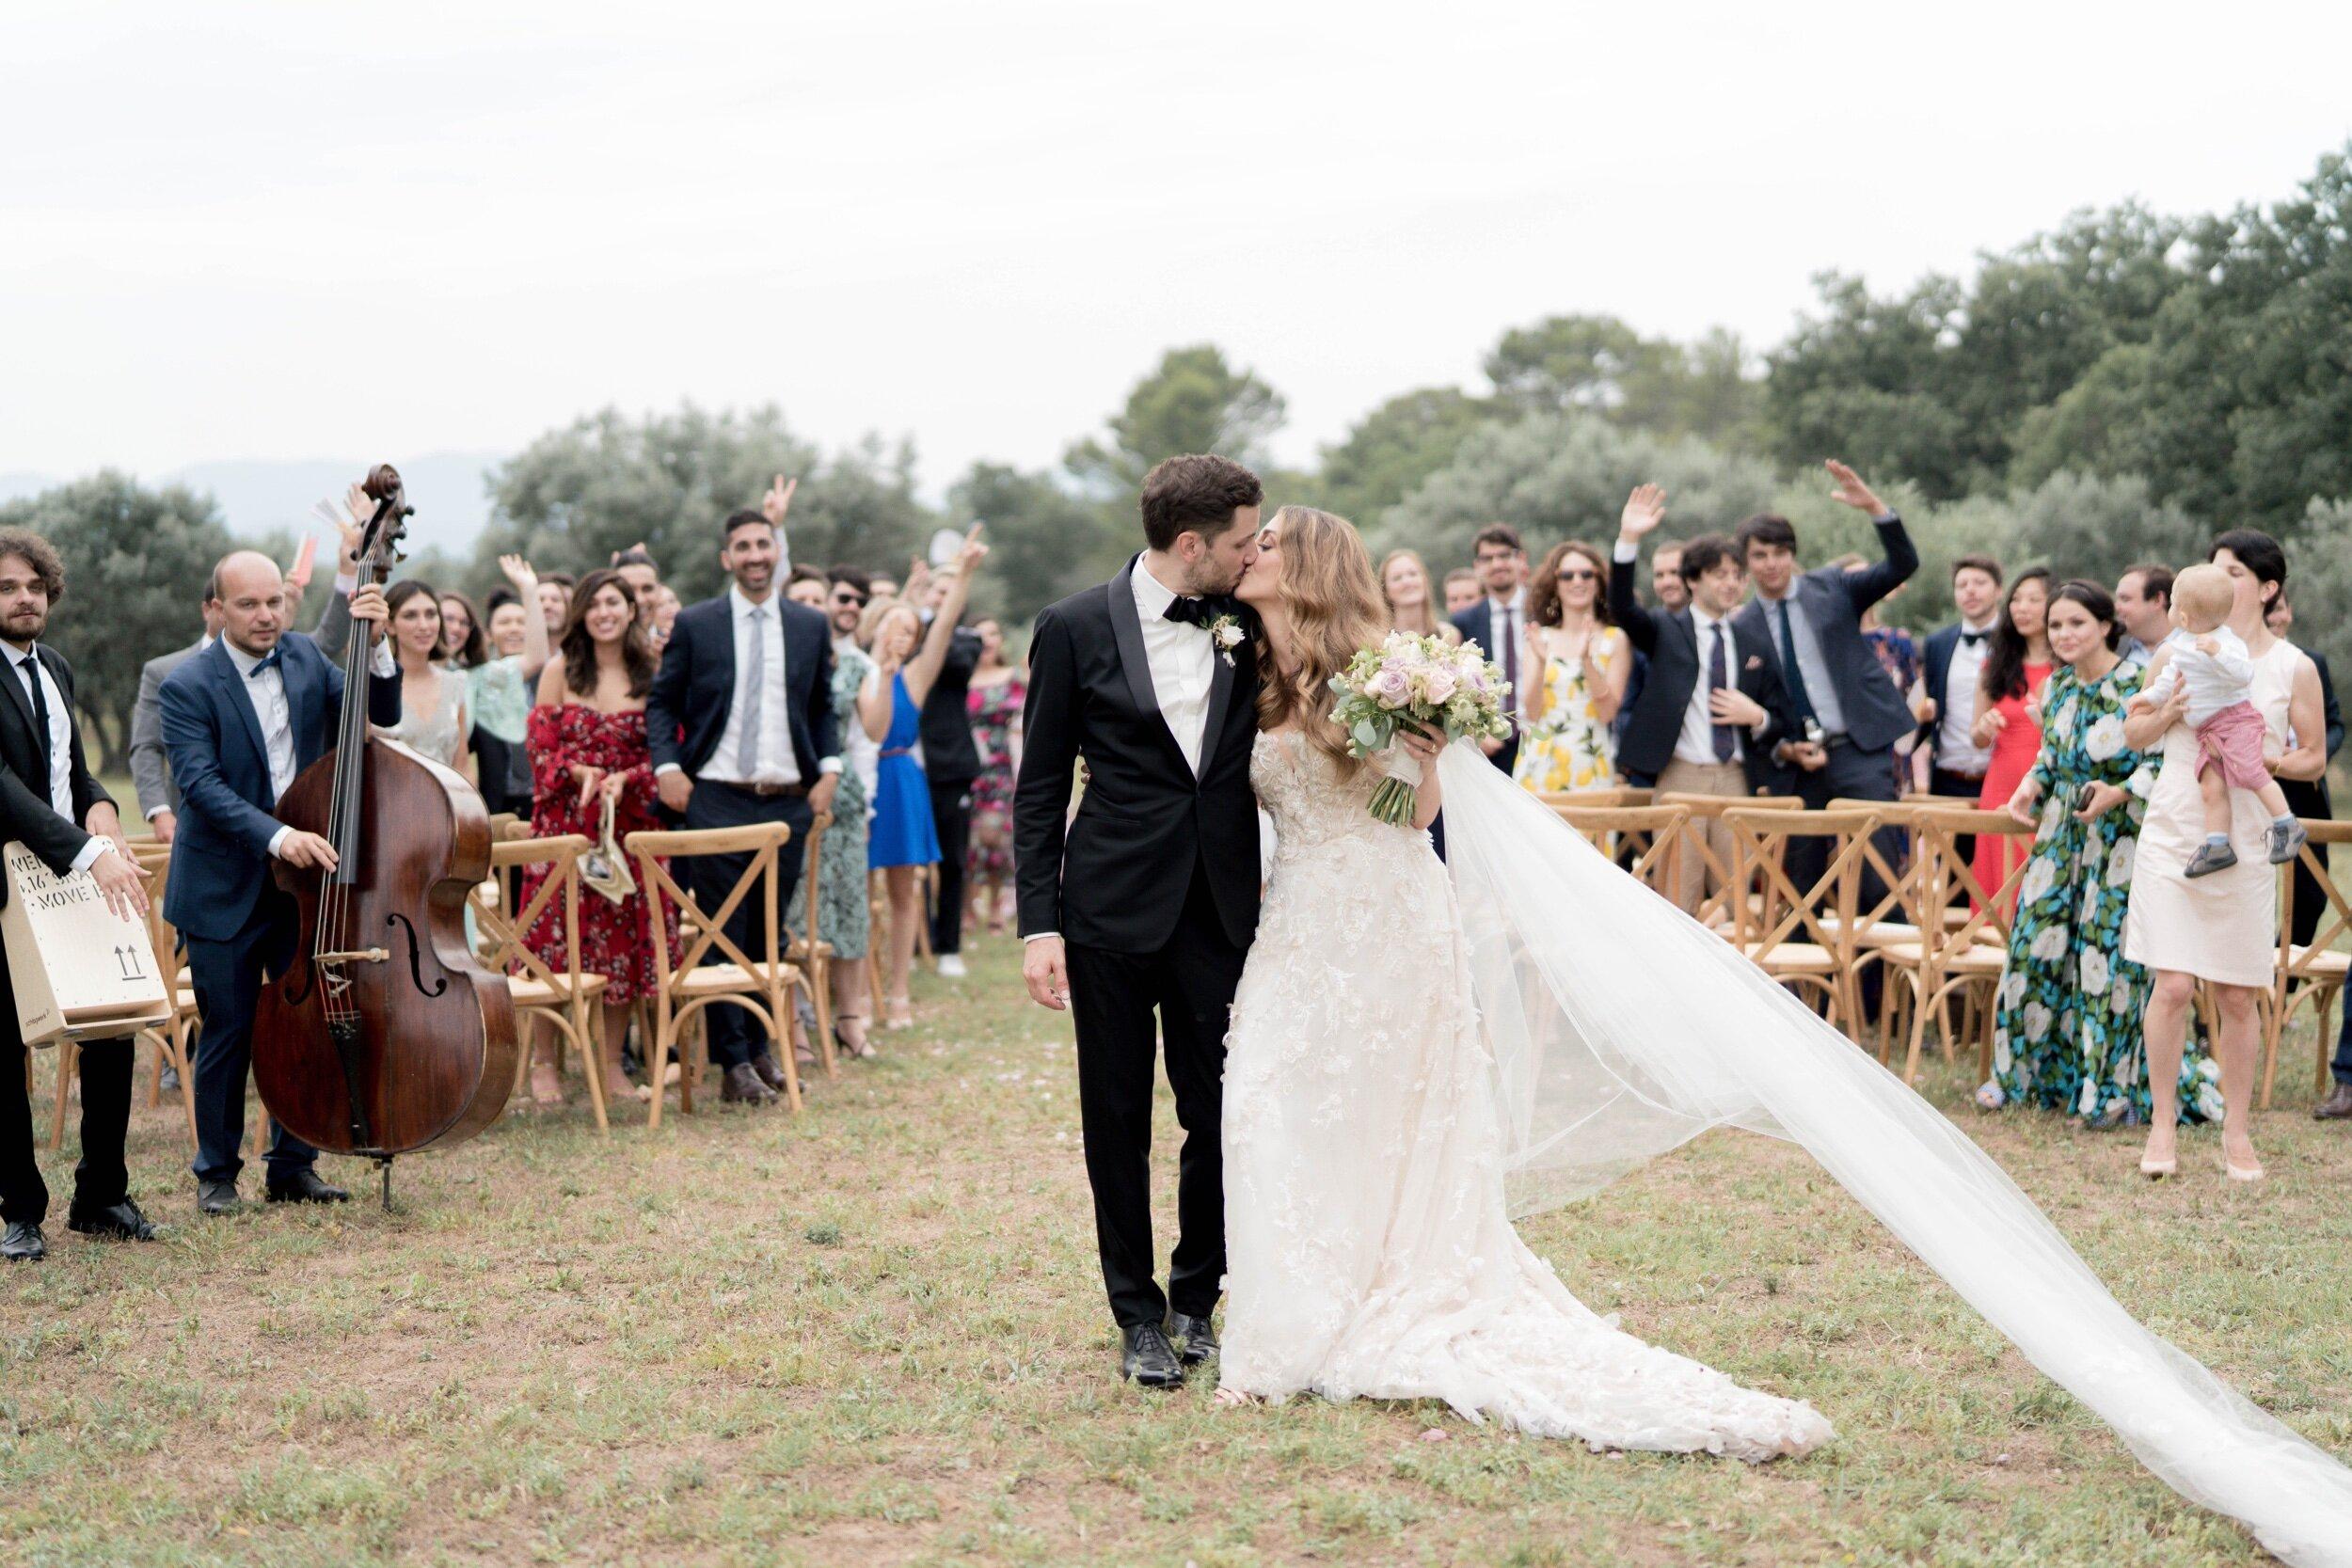 RTG Photography Wedding Photography Packages Fine Art Weddings Armenian Weddings Roman TerOvsepyan